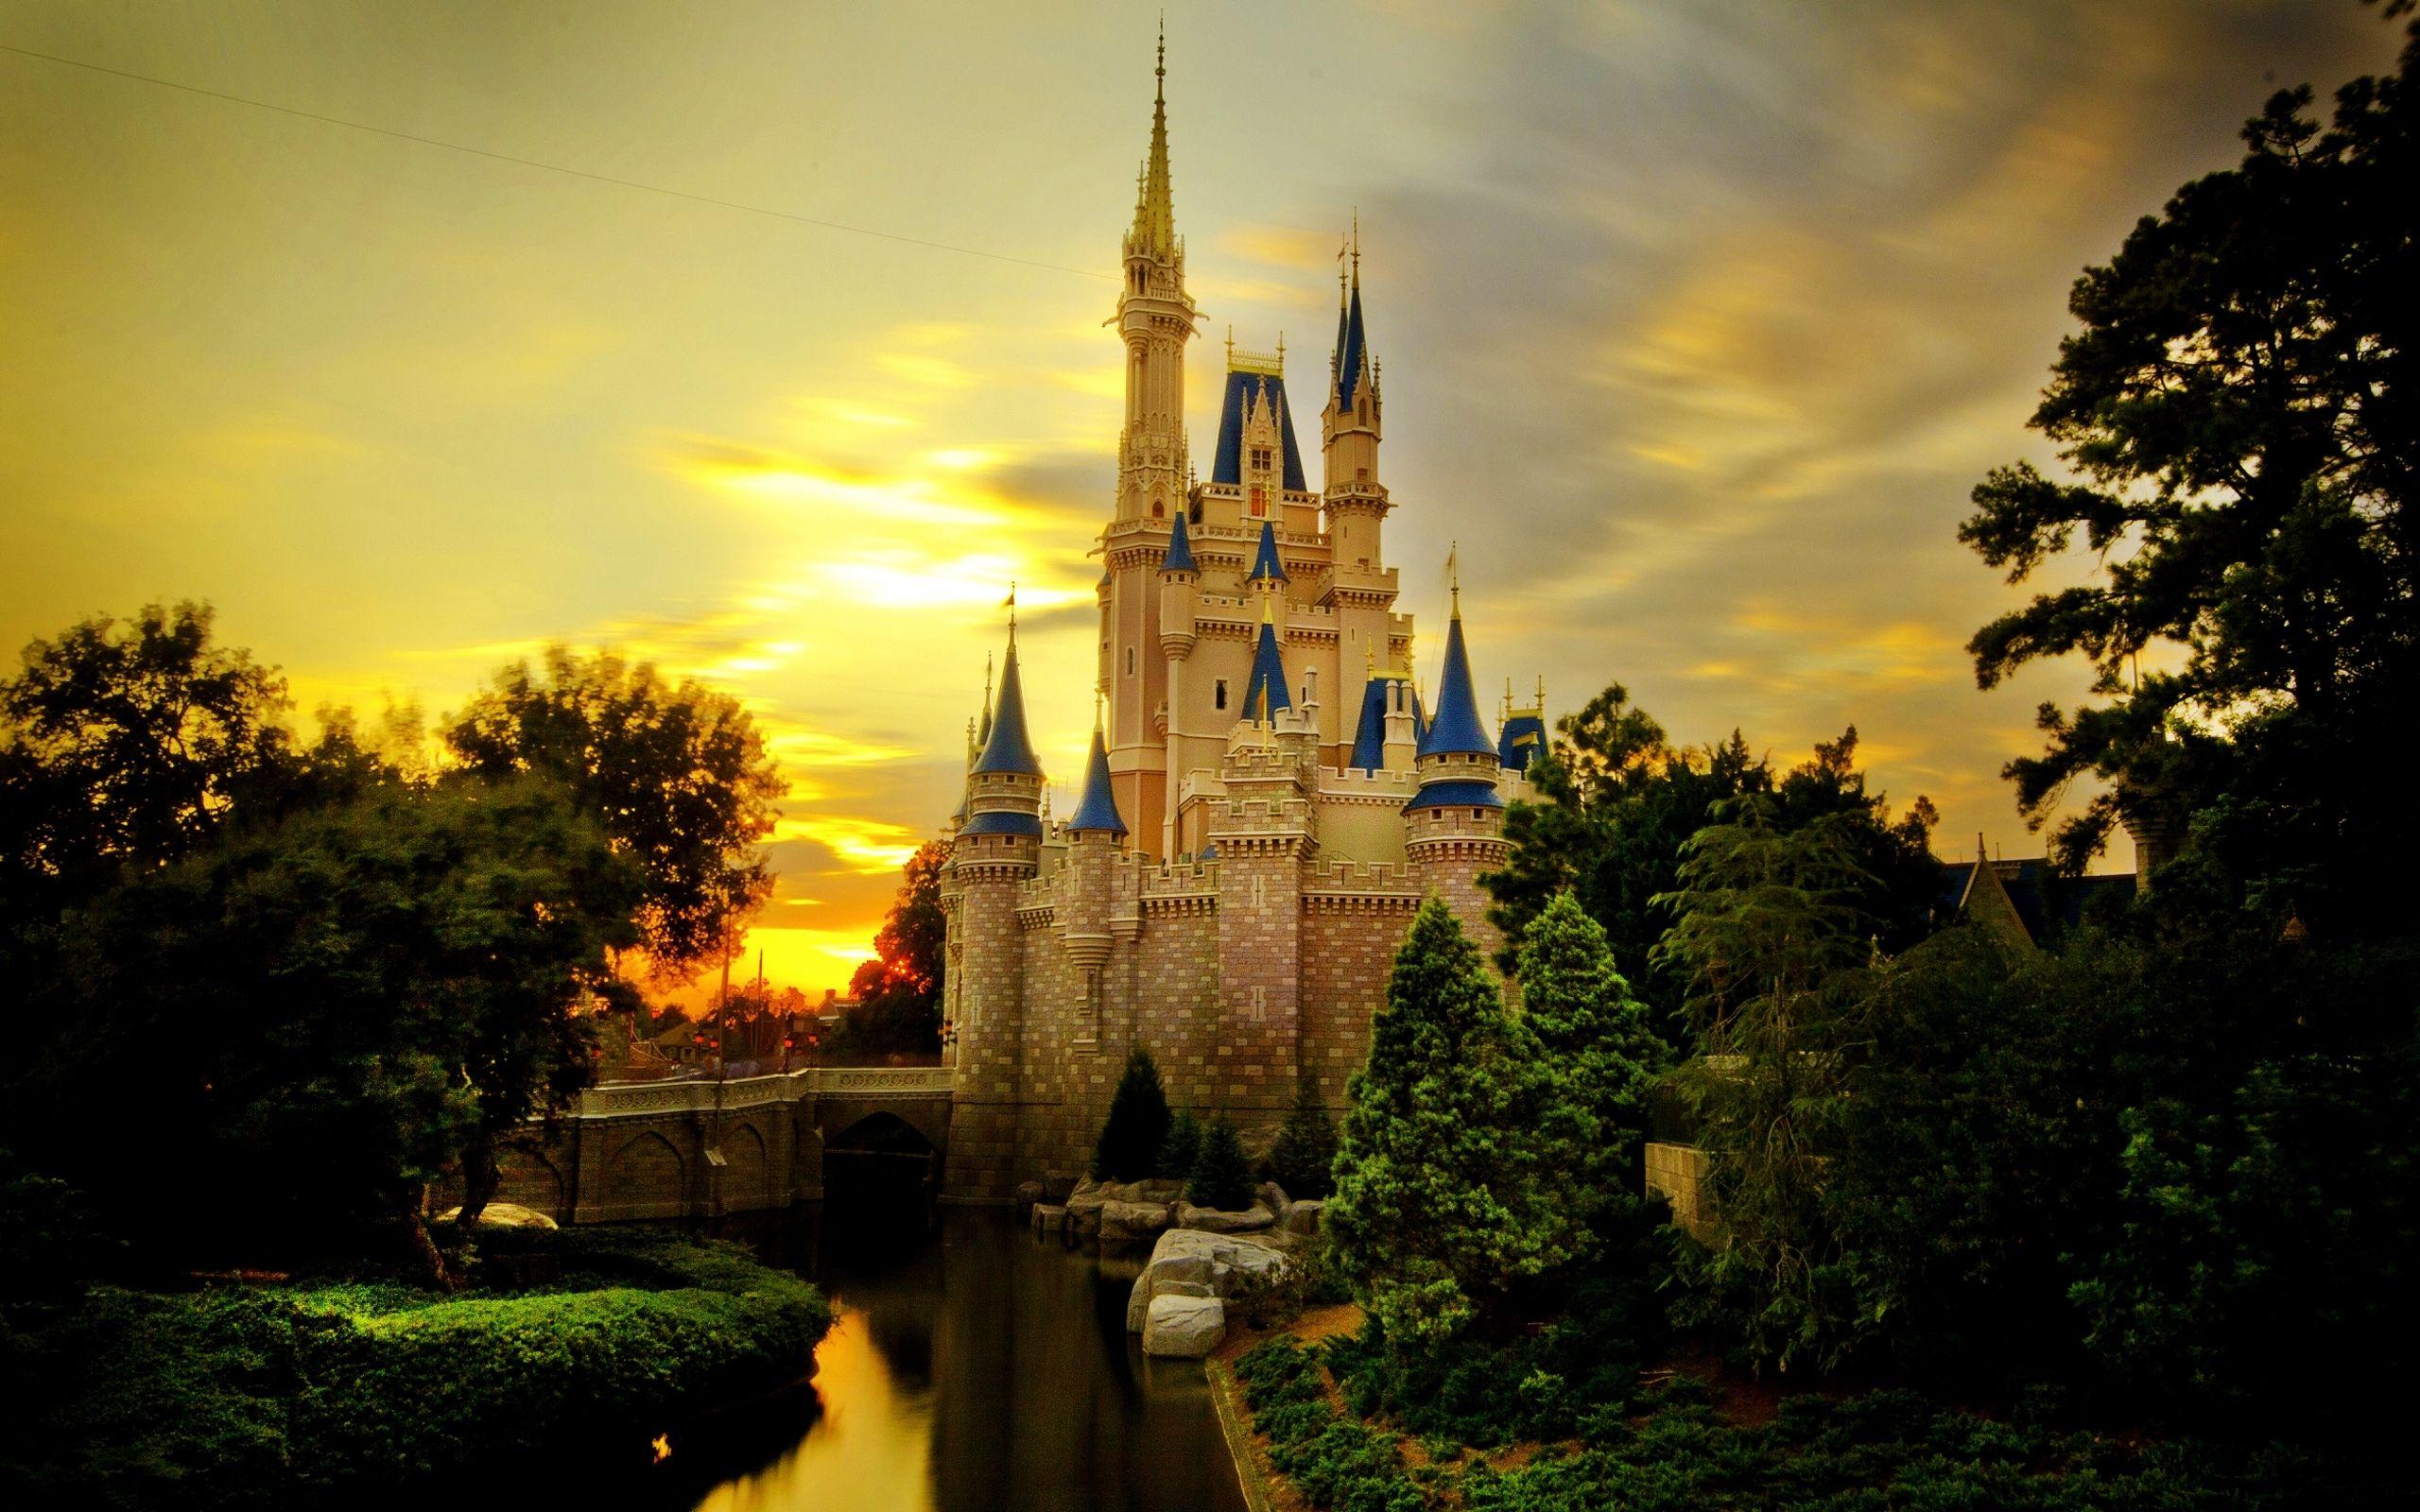 Cool Wallpaper Macbook Disneyland - 3c0f6afd01806d0c2a2b303a89bcbbc0  HD_988176.jpg